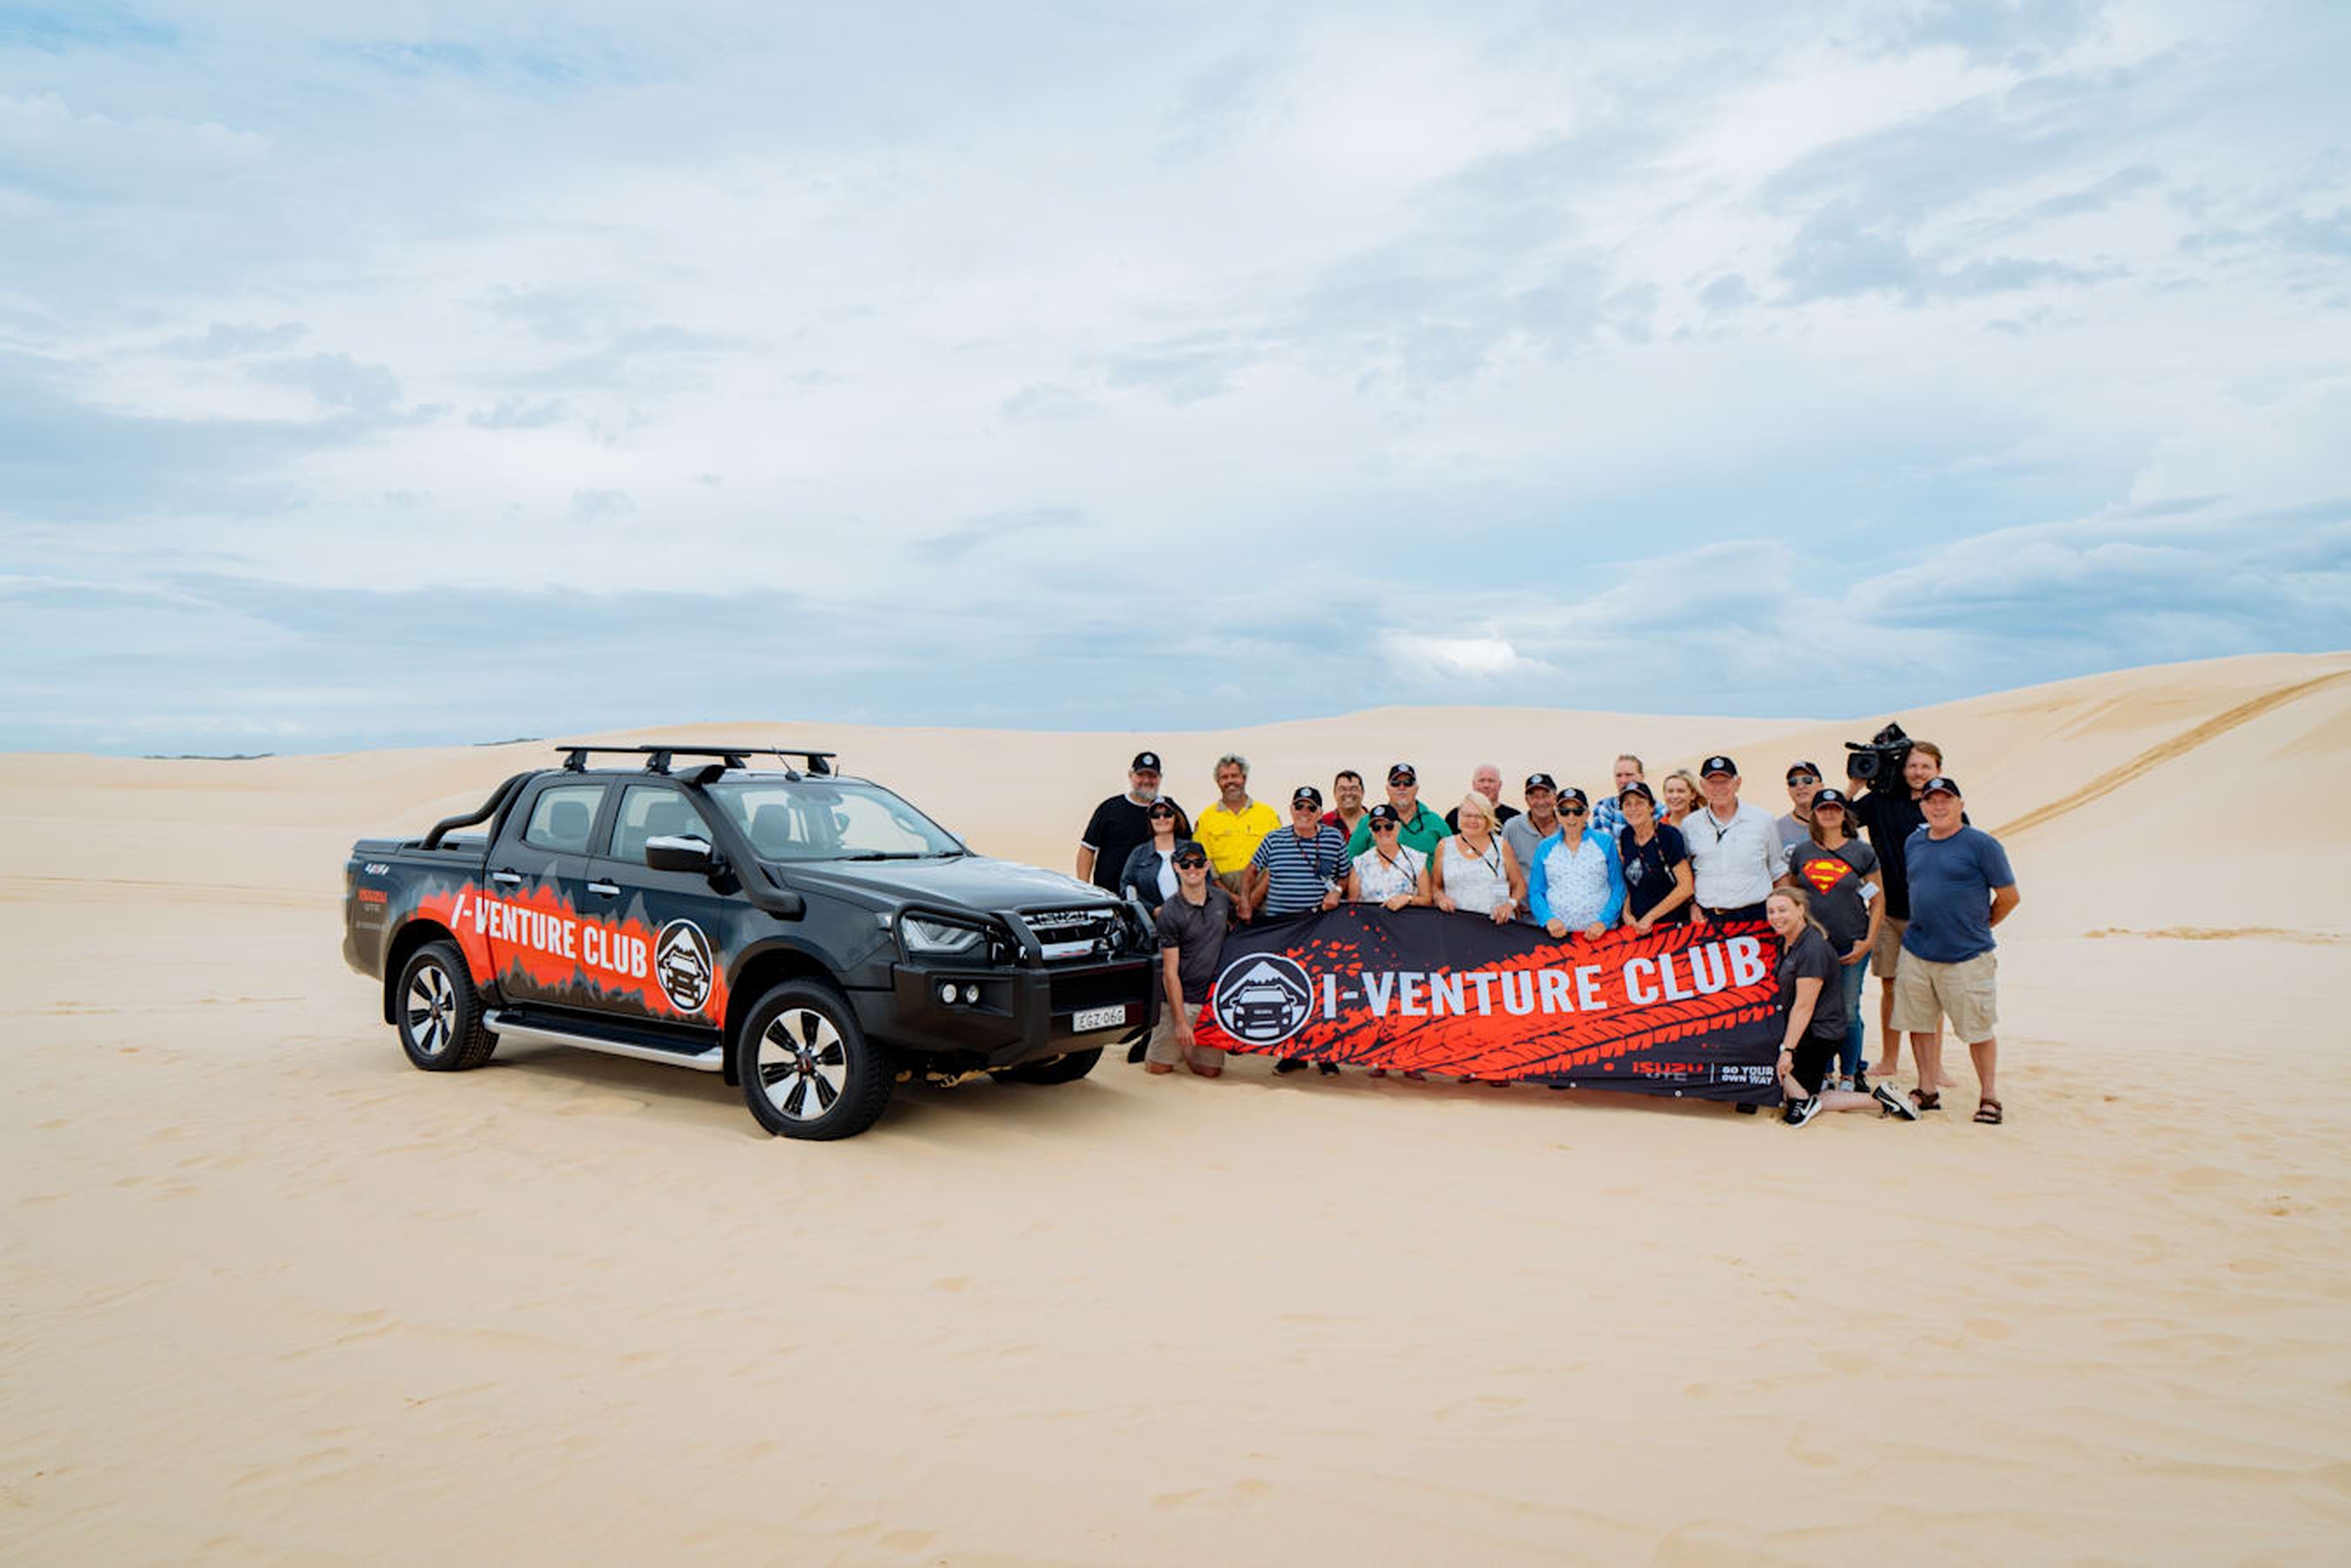 4 X 4 Australia Explore I Venture Club Stockton Beach 1